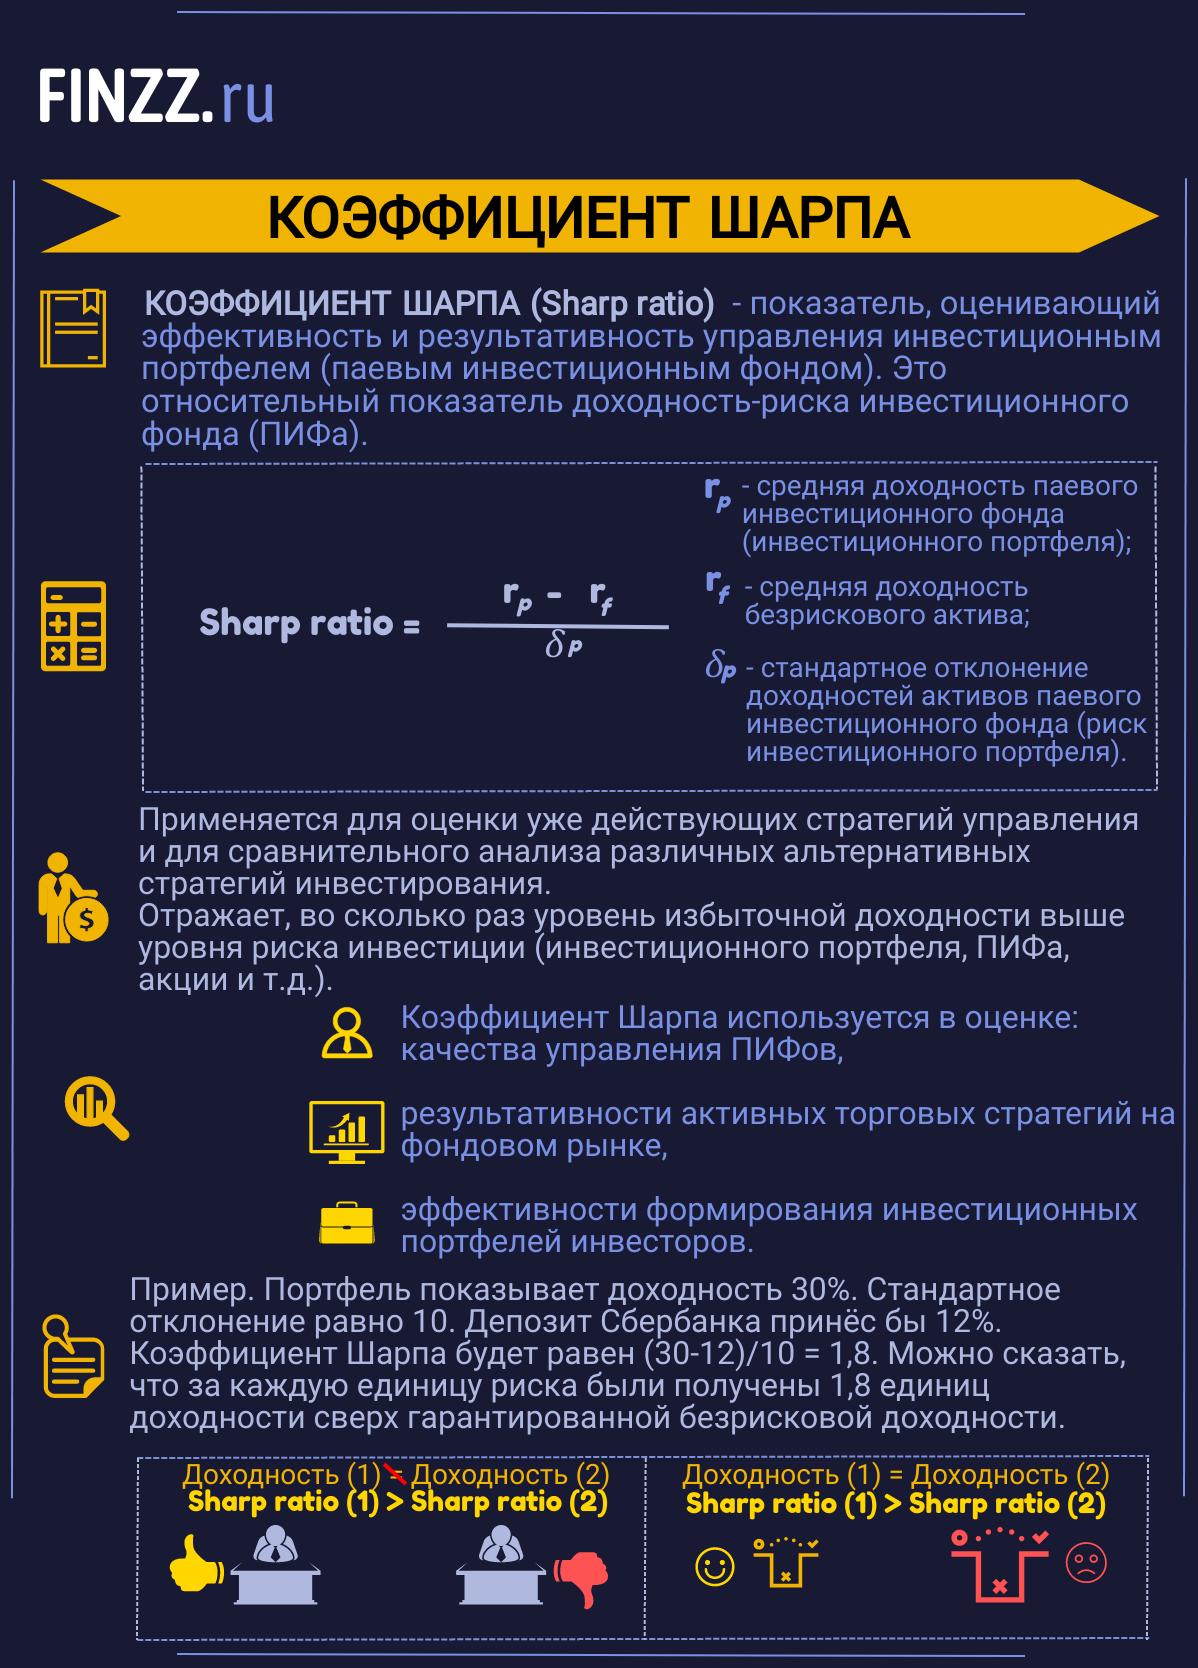 Инфографика. Коэффициент Шарпа